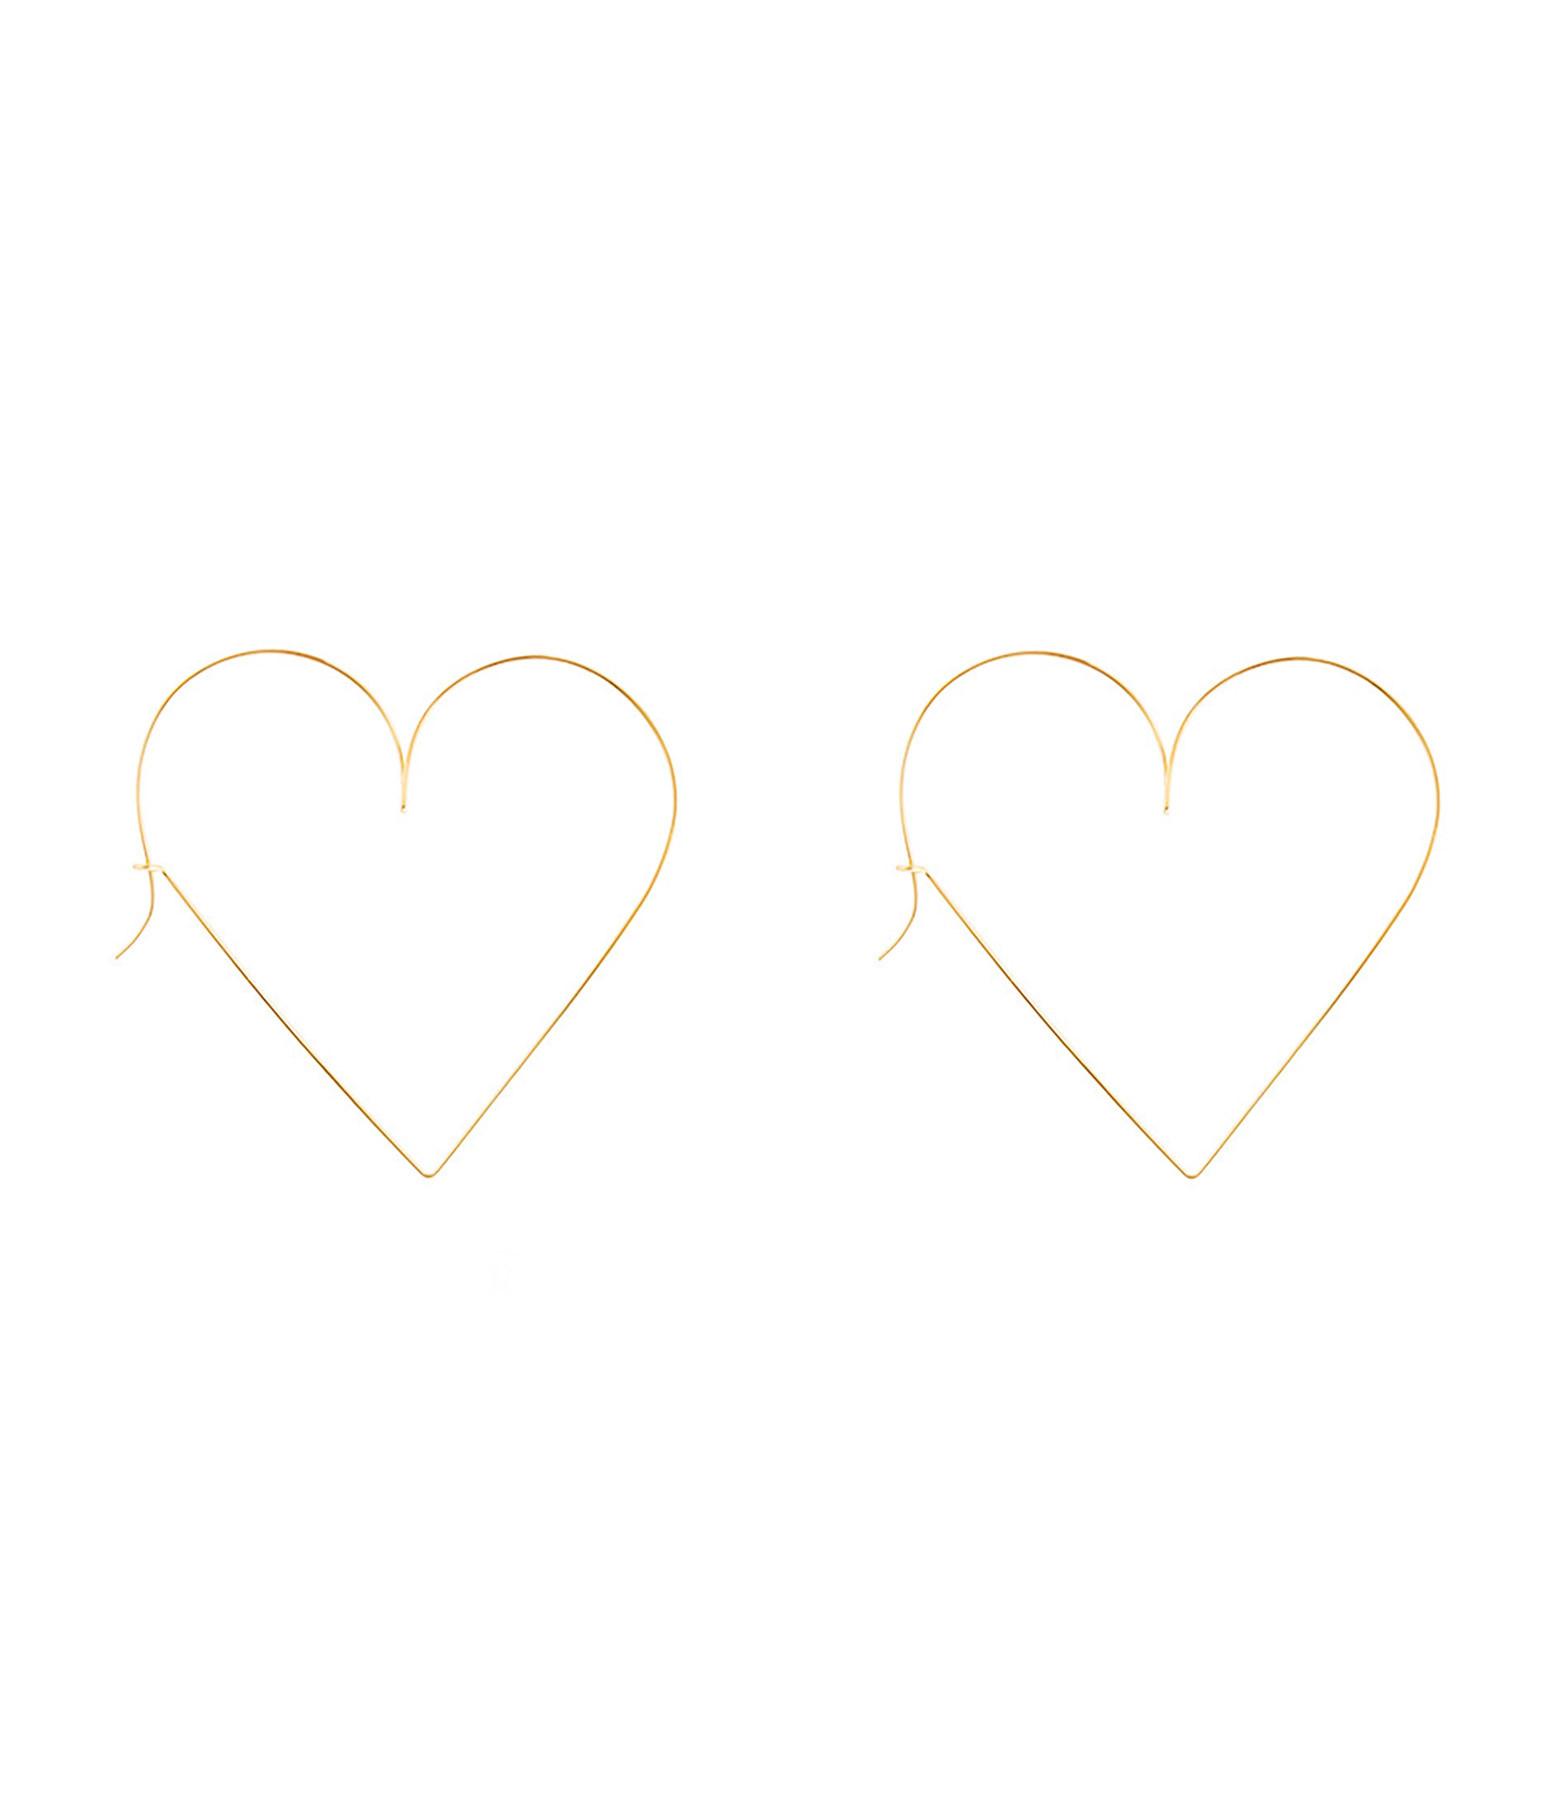 ATELIER PAULIN - Créoles Cœur Nude Gold Filled 14K Jaune